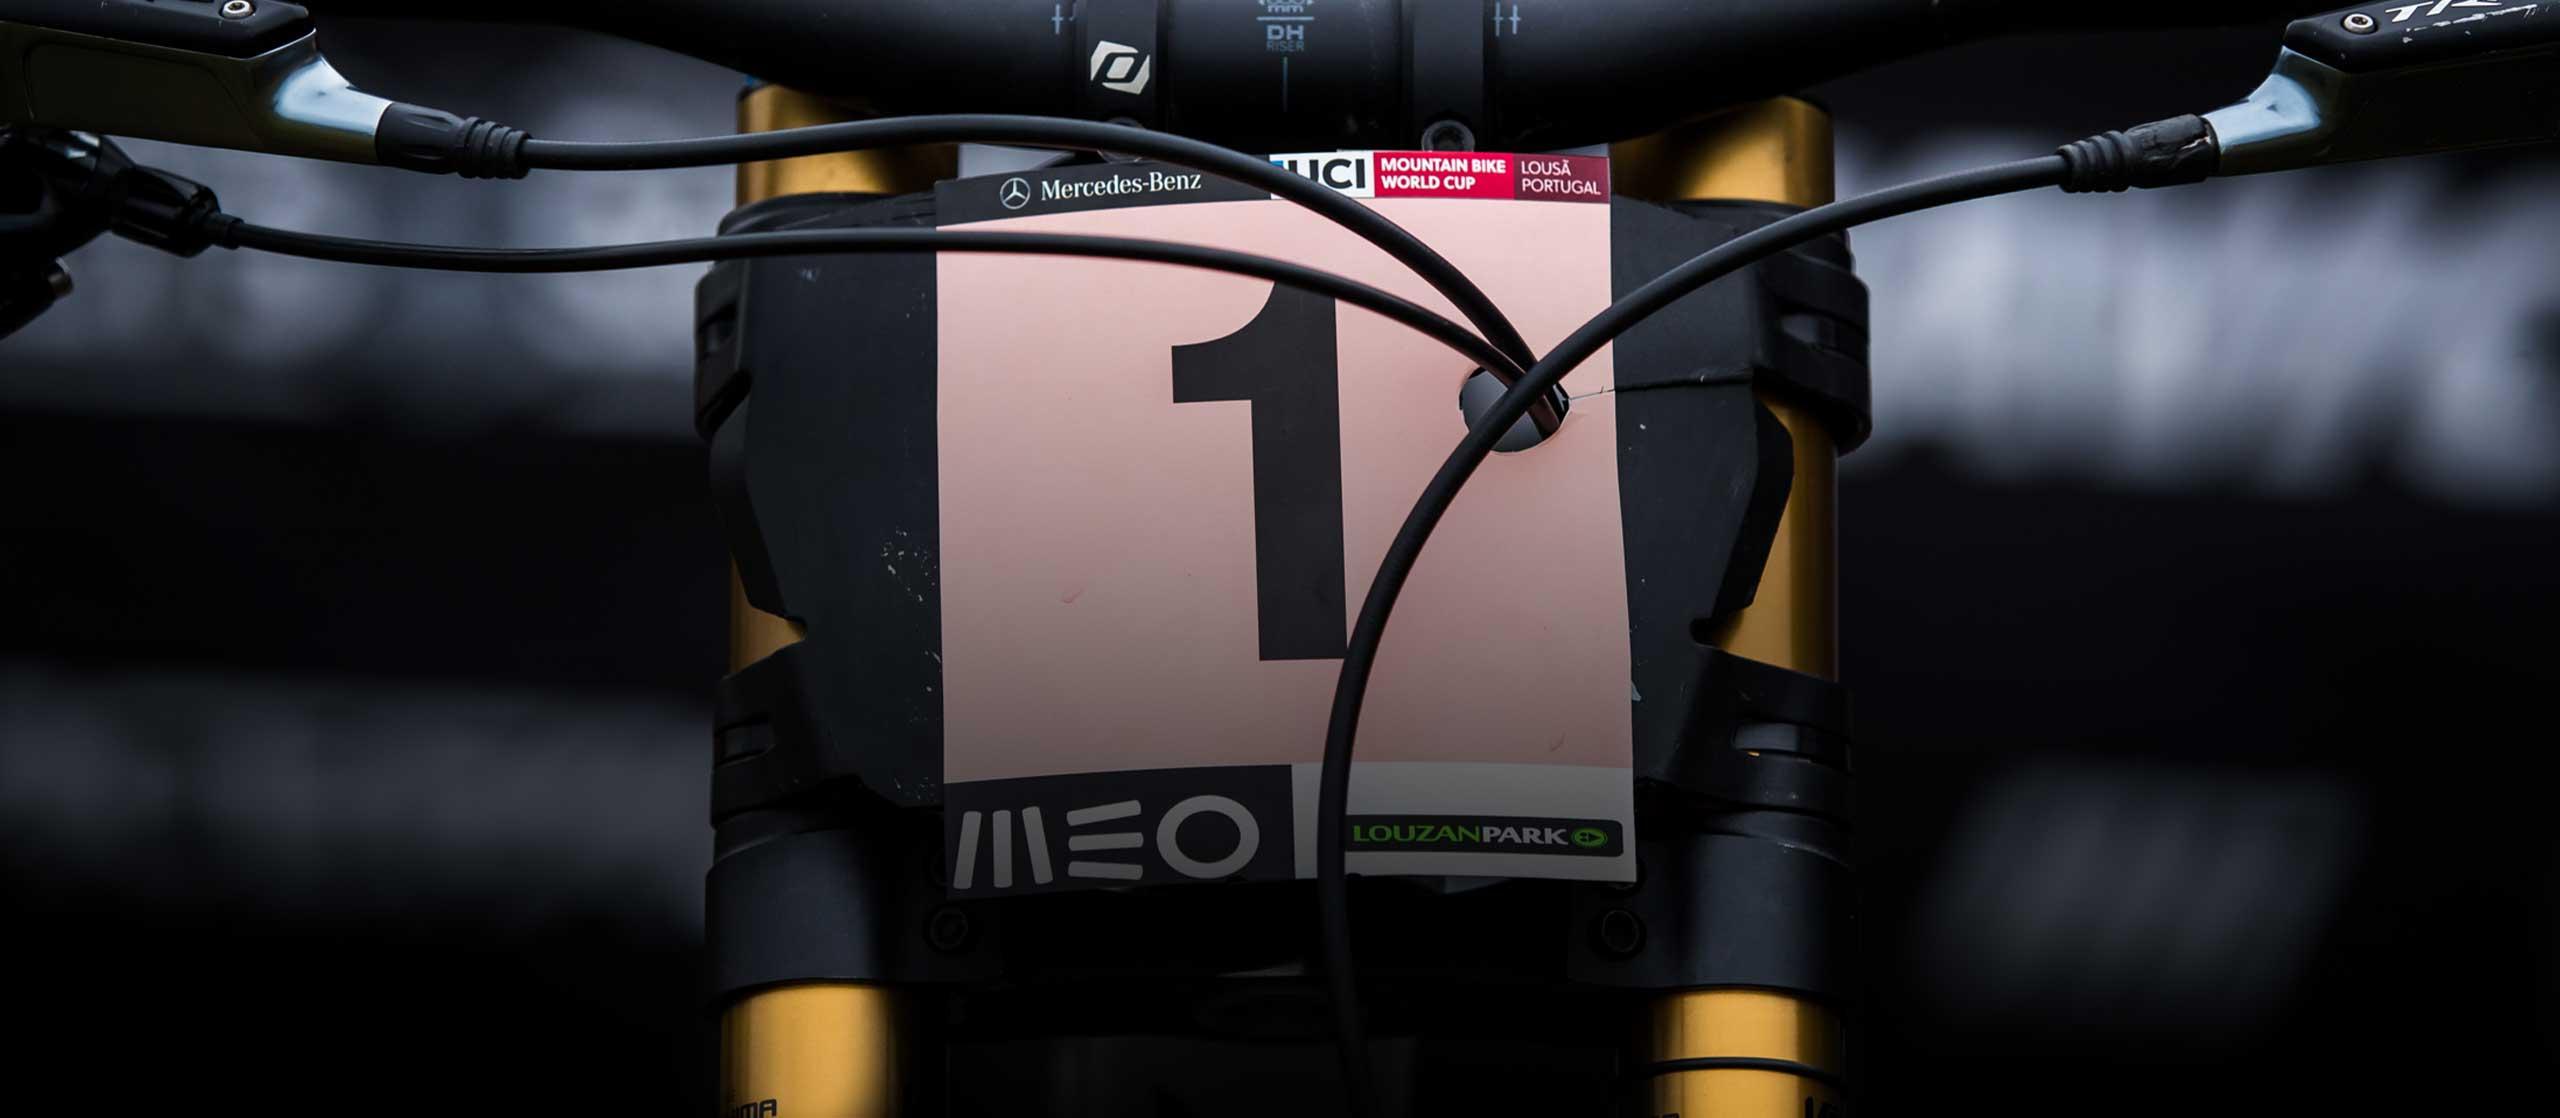 Bluegrass Legit Carbon Full Face Helmet for Downhill and Enduro MTB